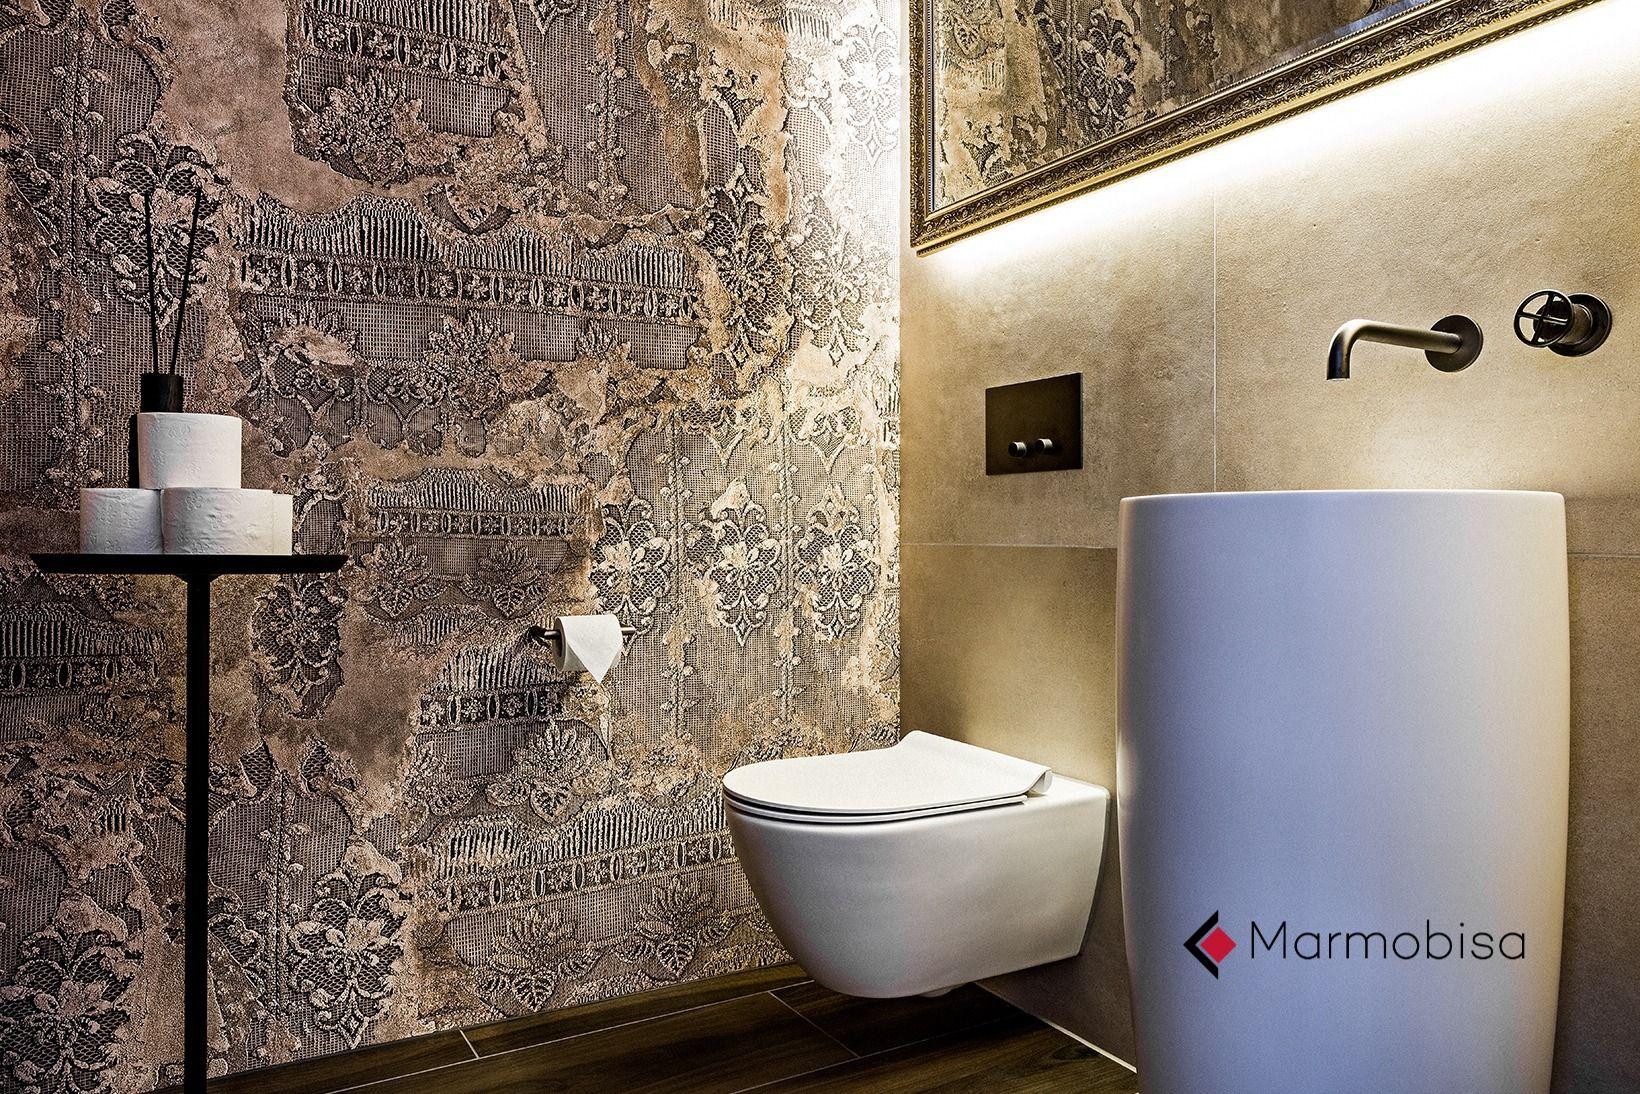 Stilvoller Wandbelag In Der Toilette Belag Feinsteinzeug Wand